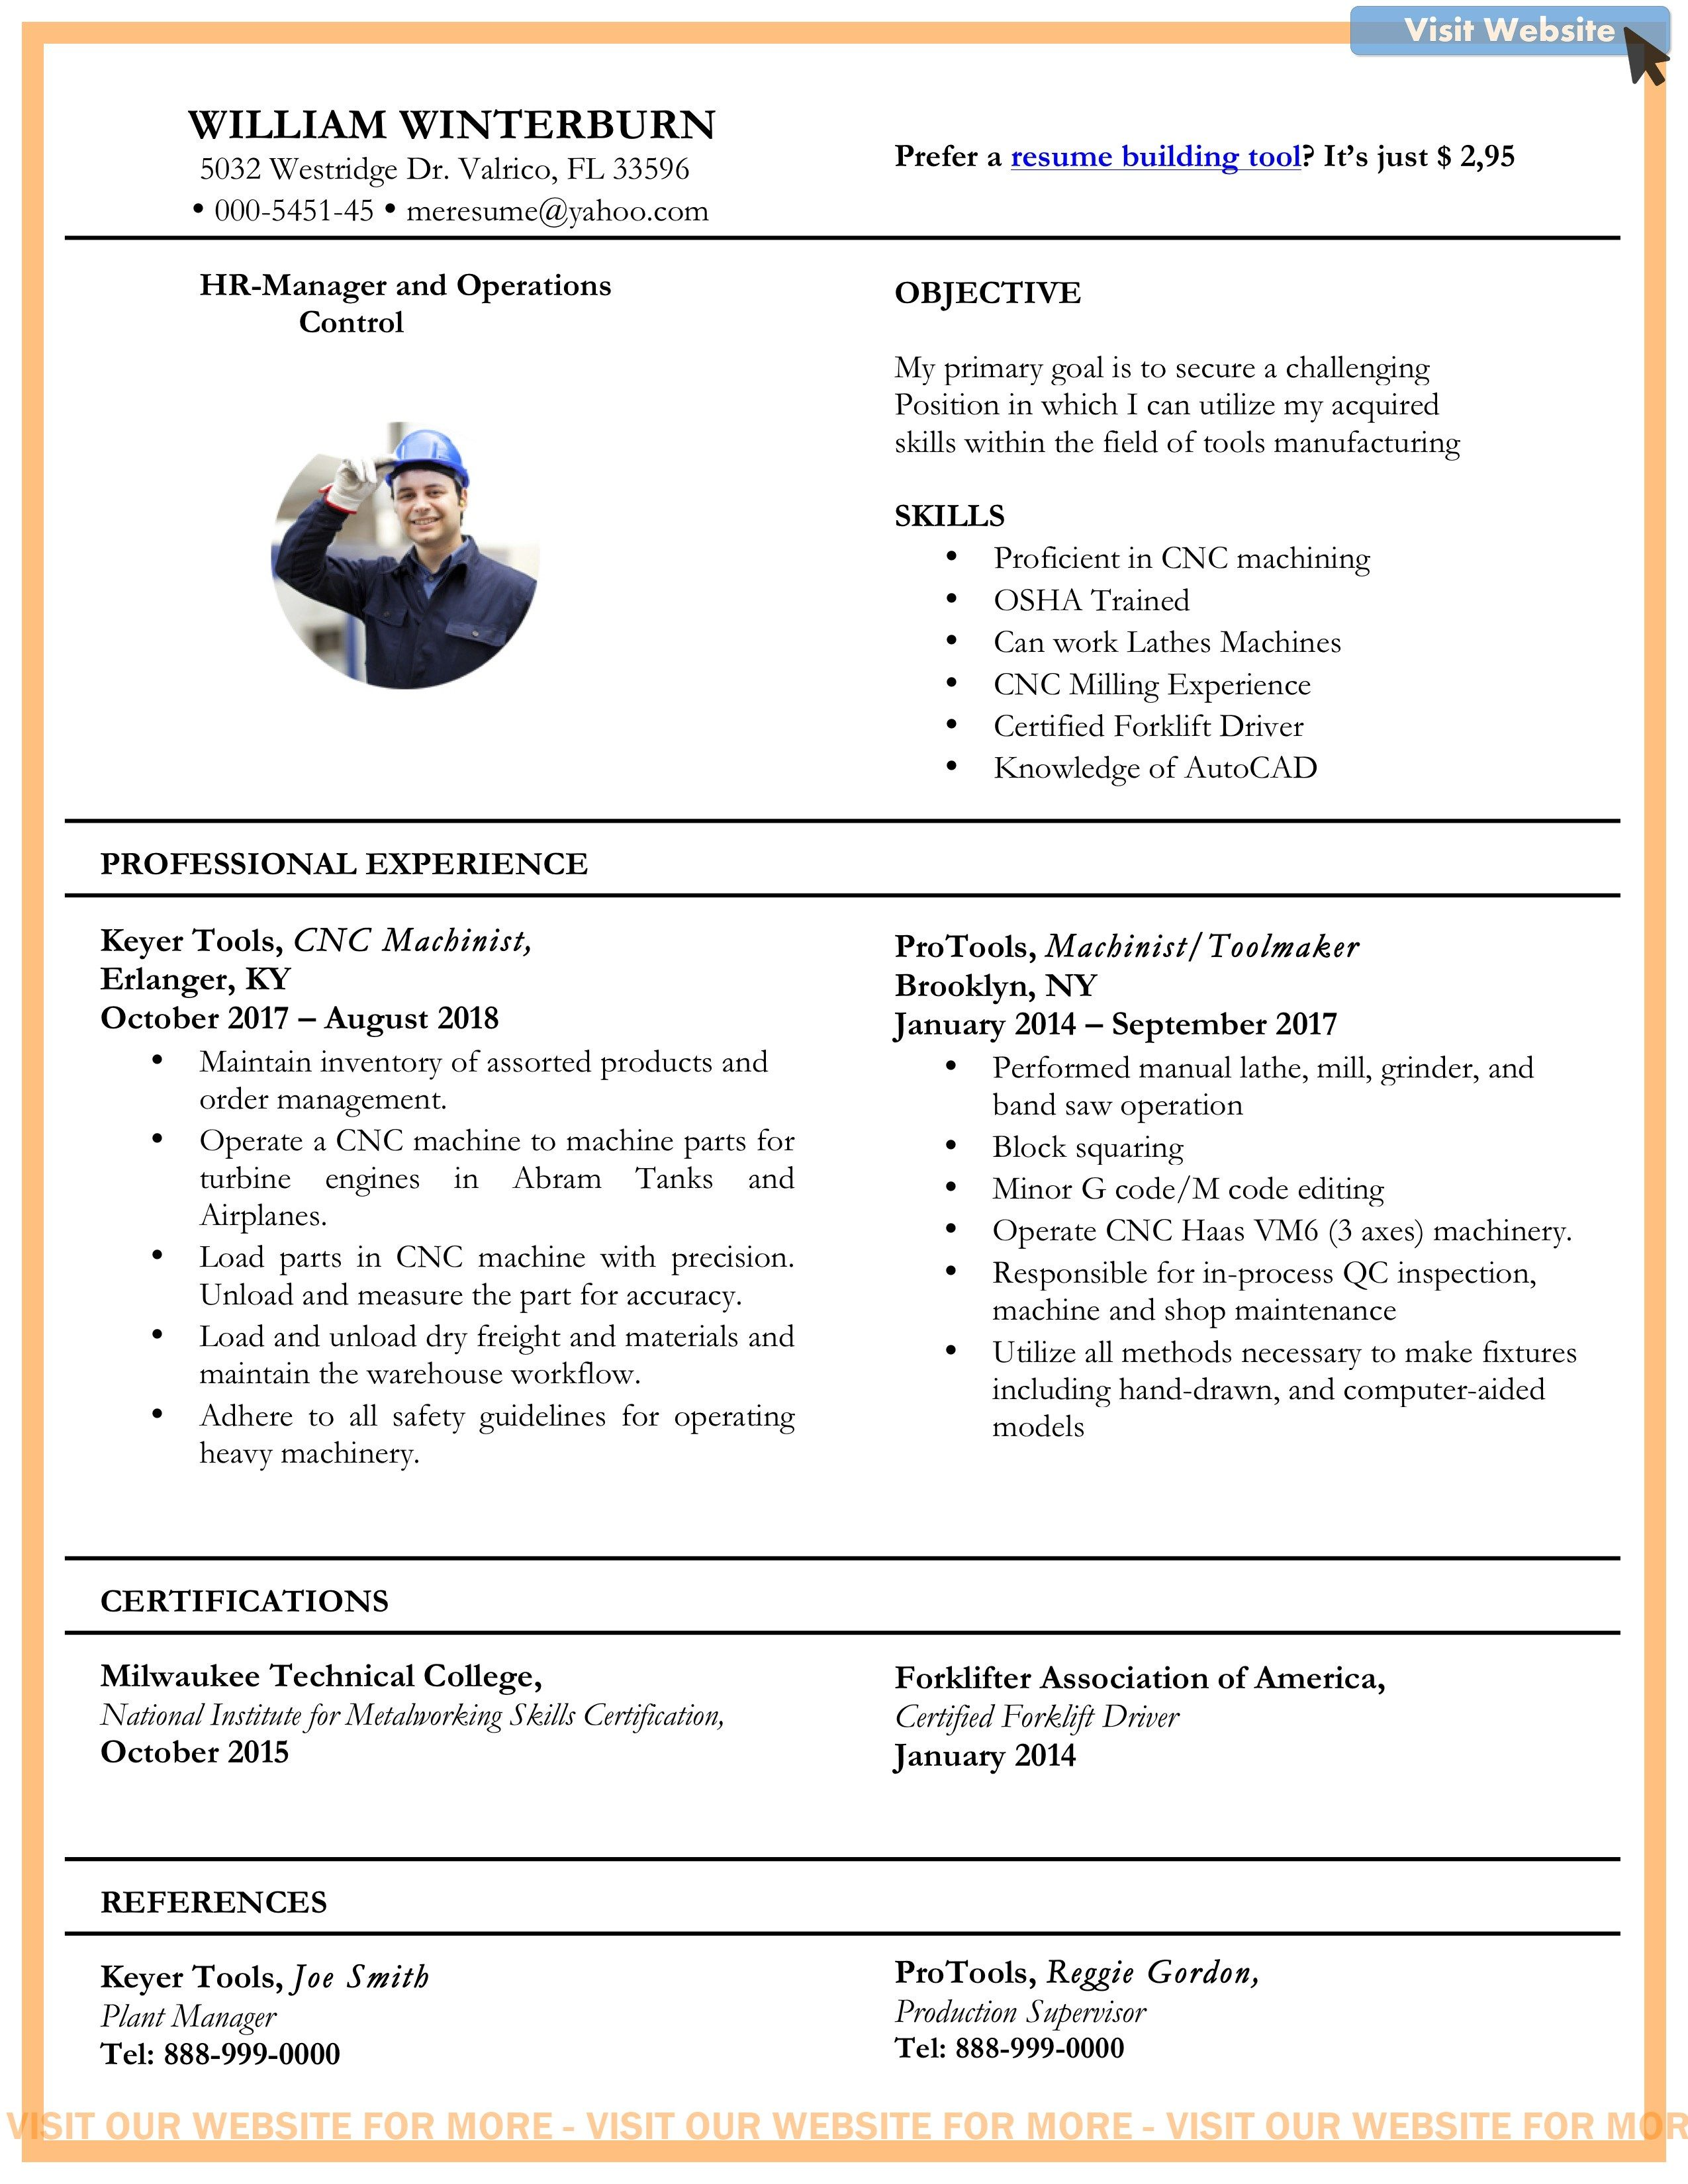 Banking resume samples free in 2020 microsoft word